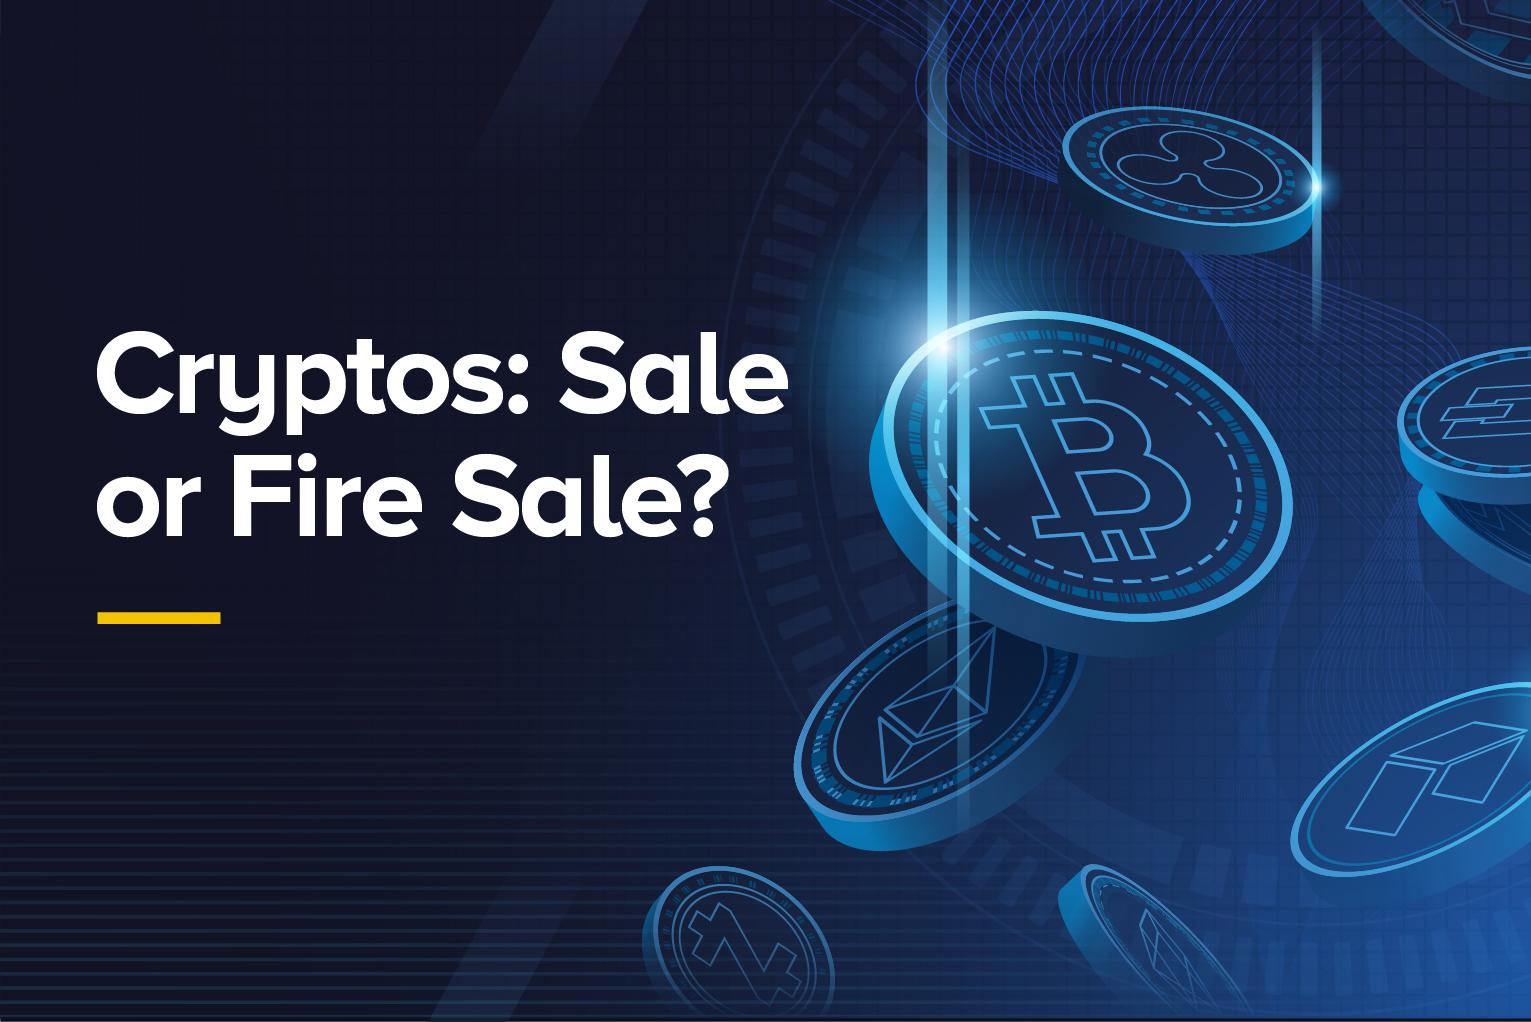 Cryptos: Sale or Fire Sale?